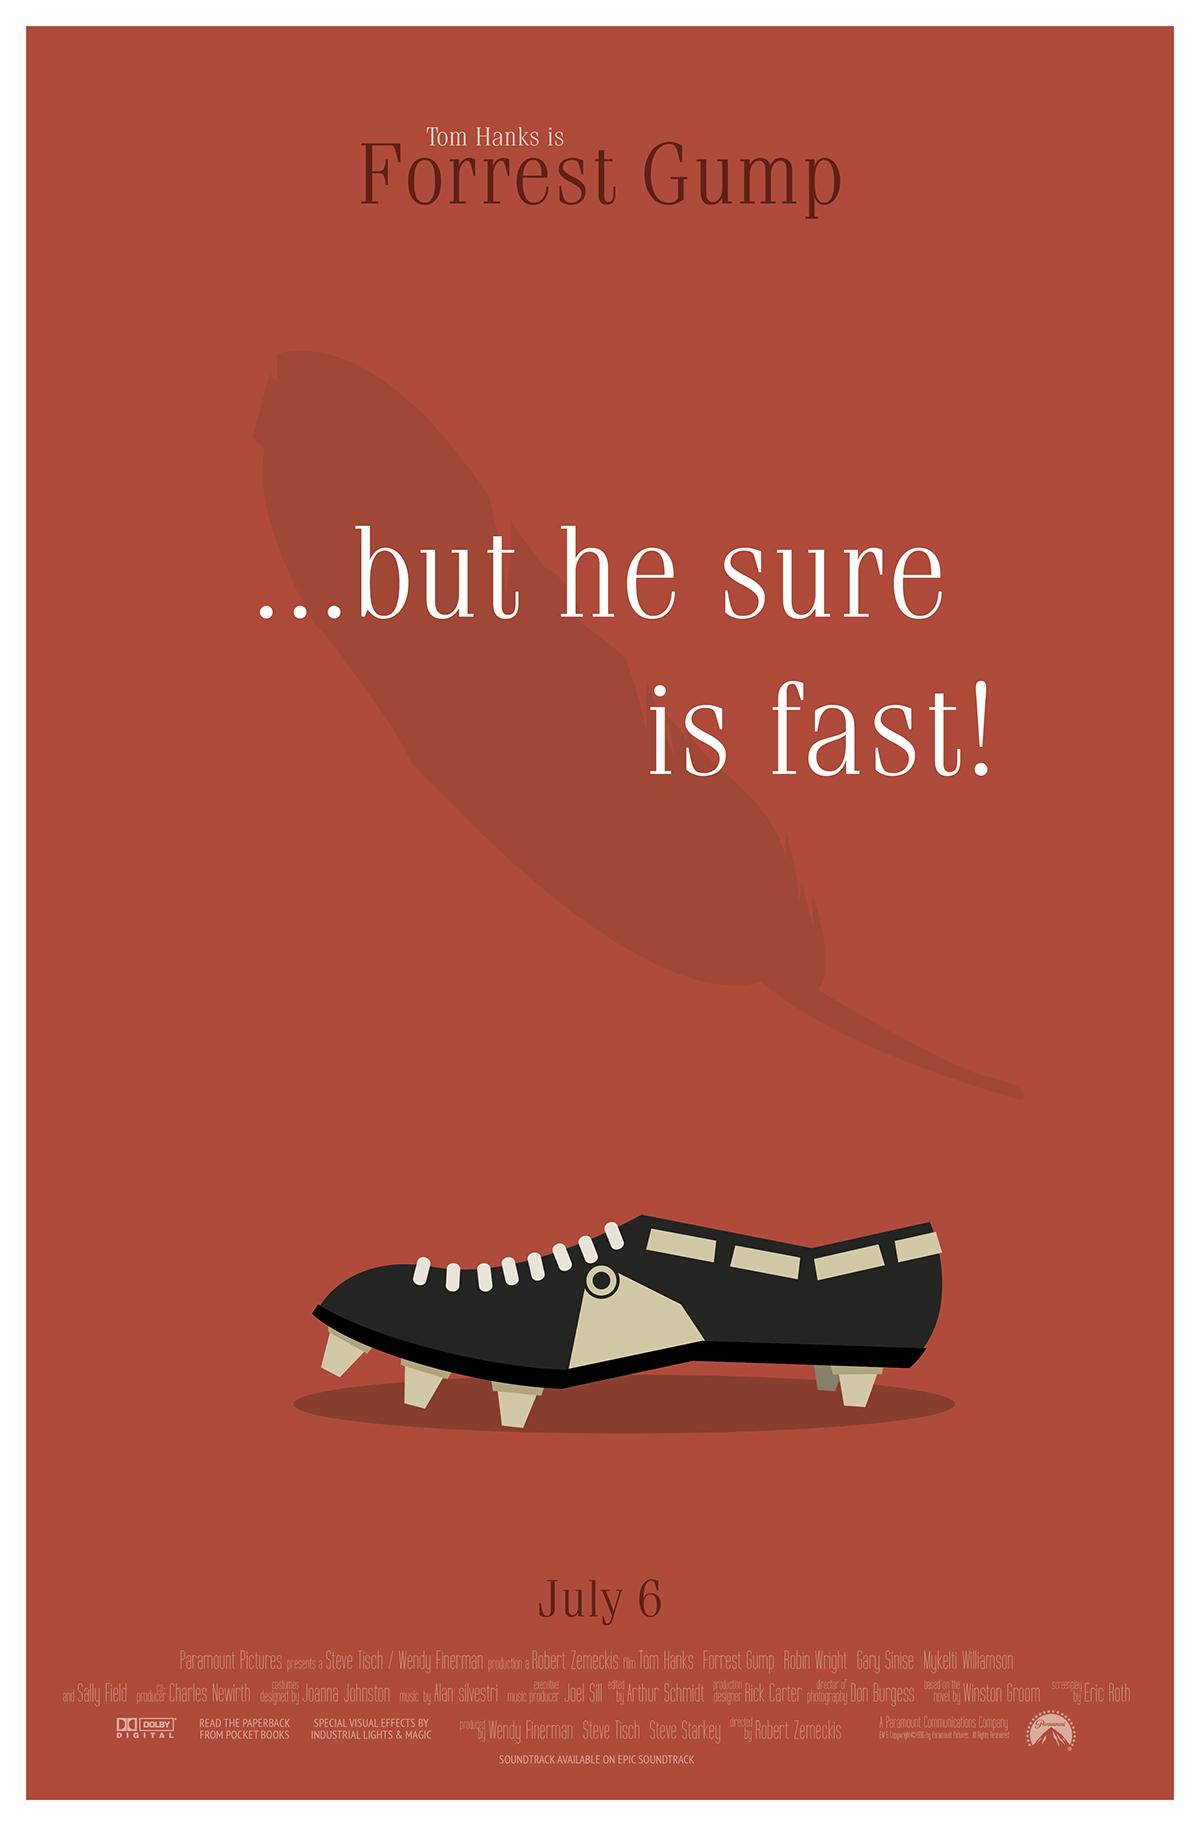 Forrest Gump Movie Poster Series On Behance